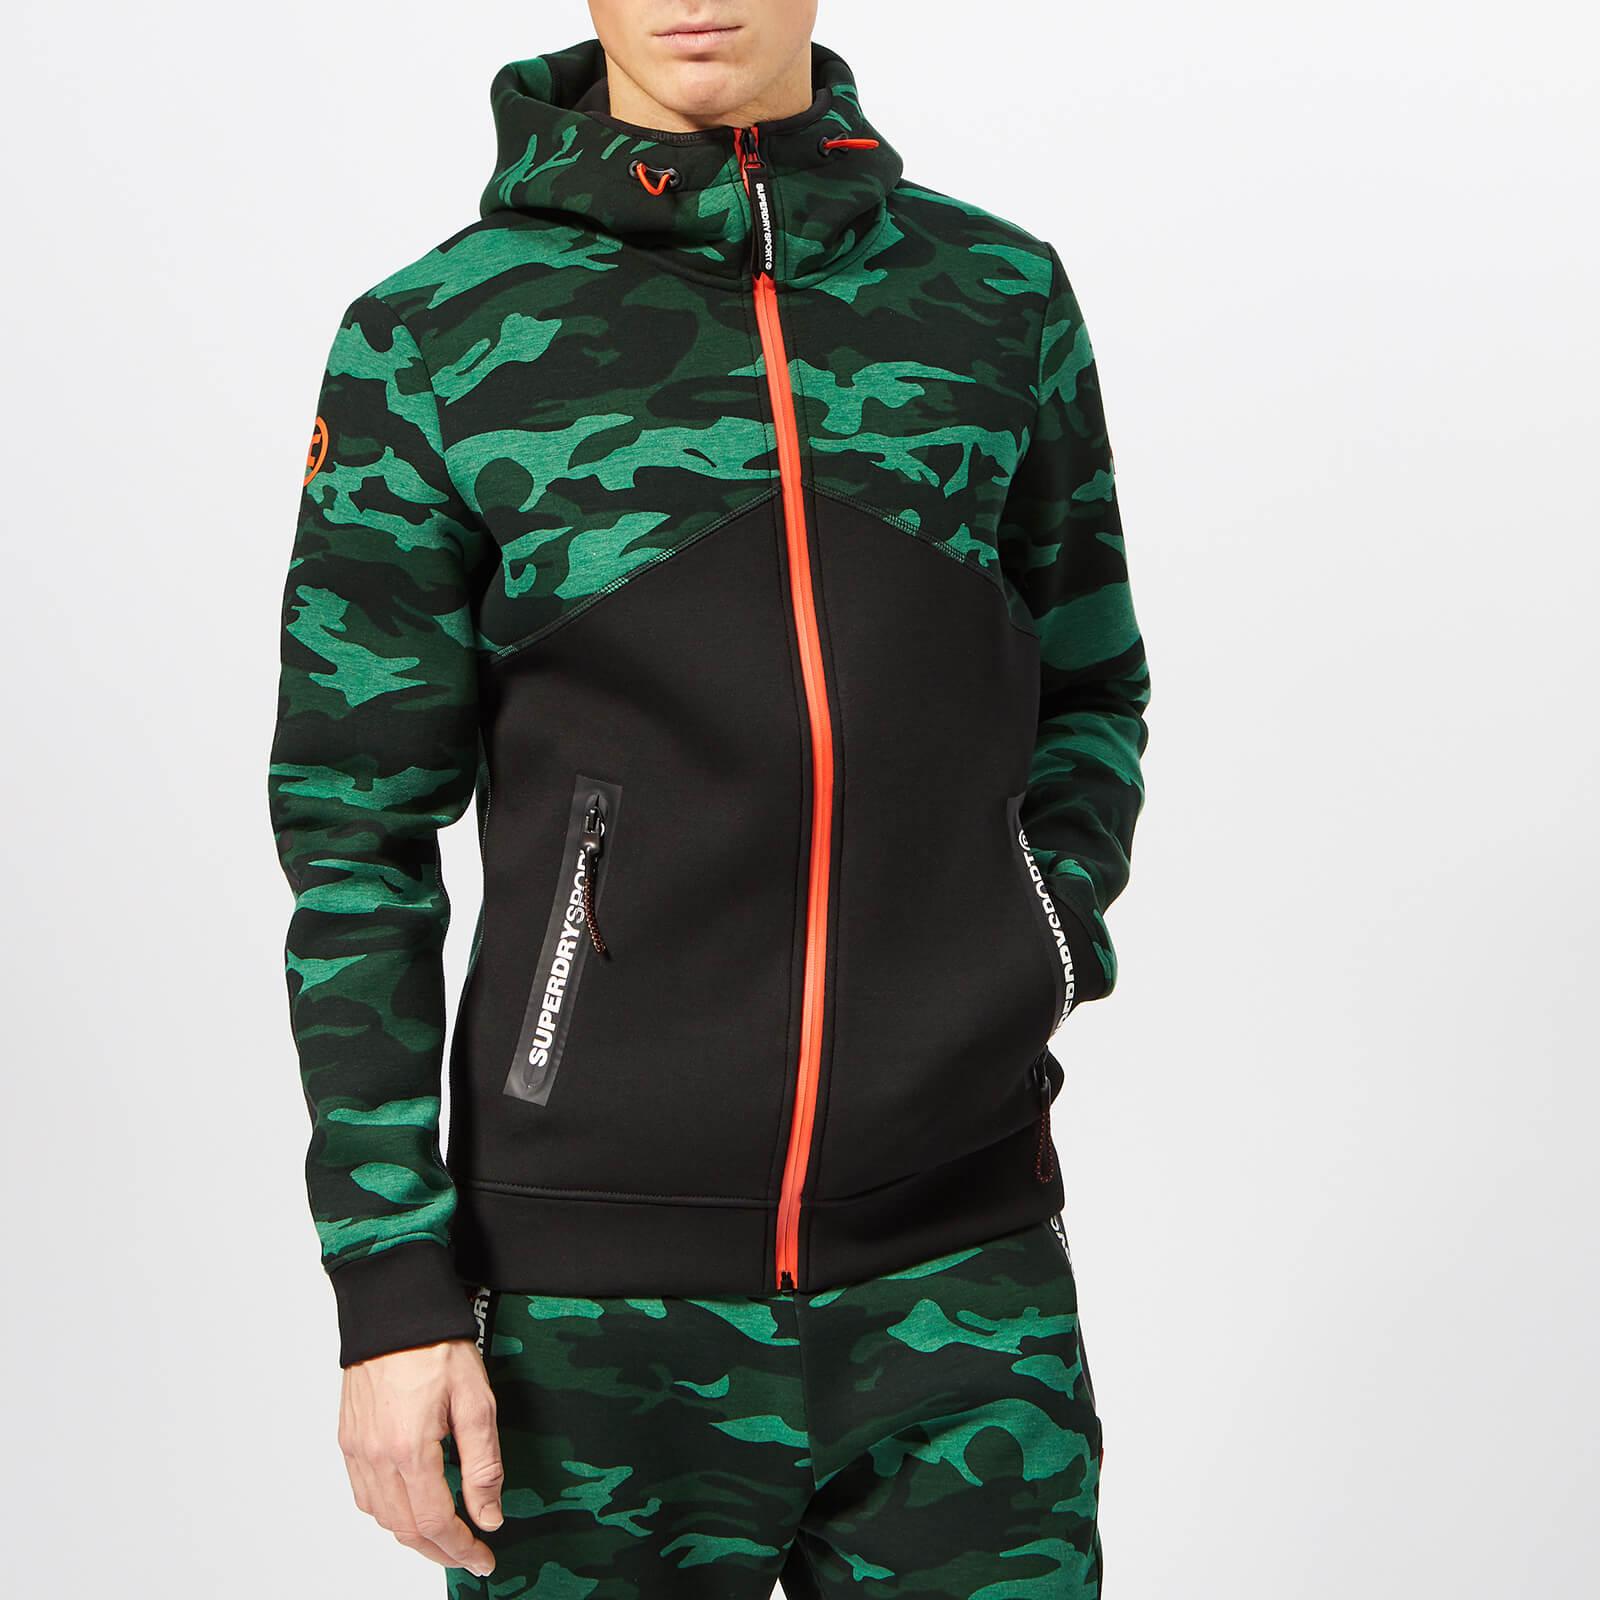 Superdry Sport Men's Gym Tech Spliced Zip Hoody - Forest Camo - S - Green